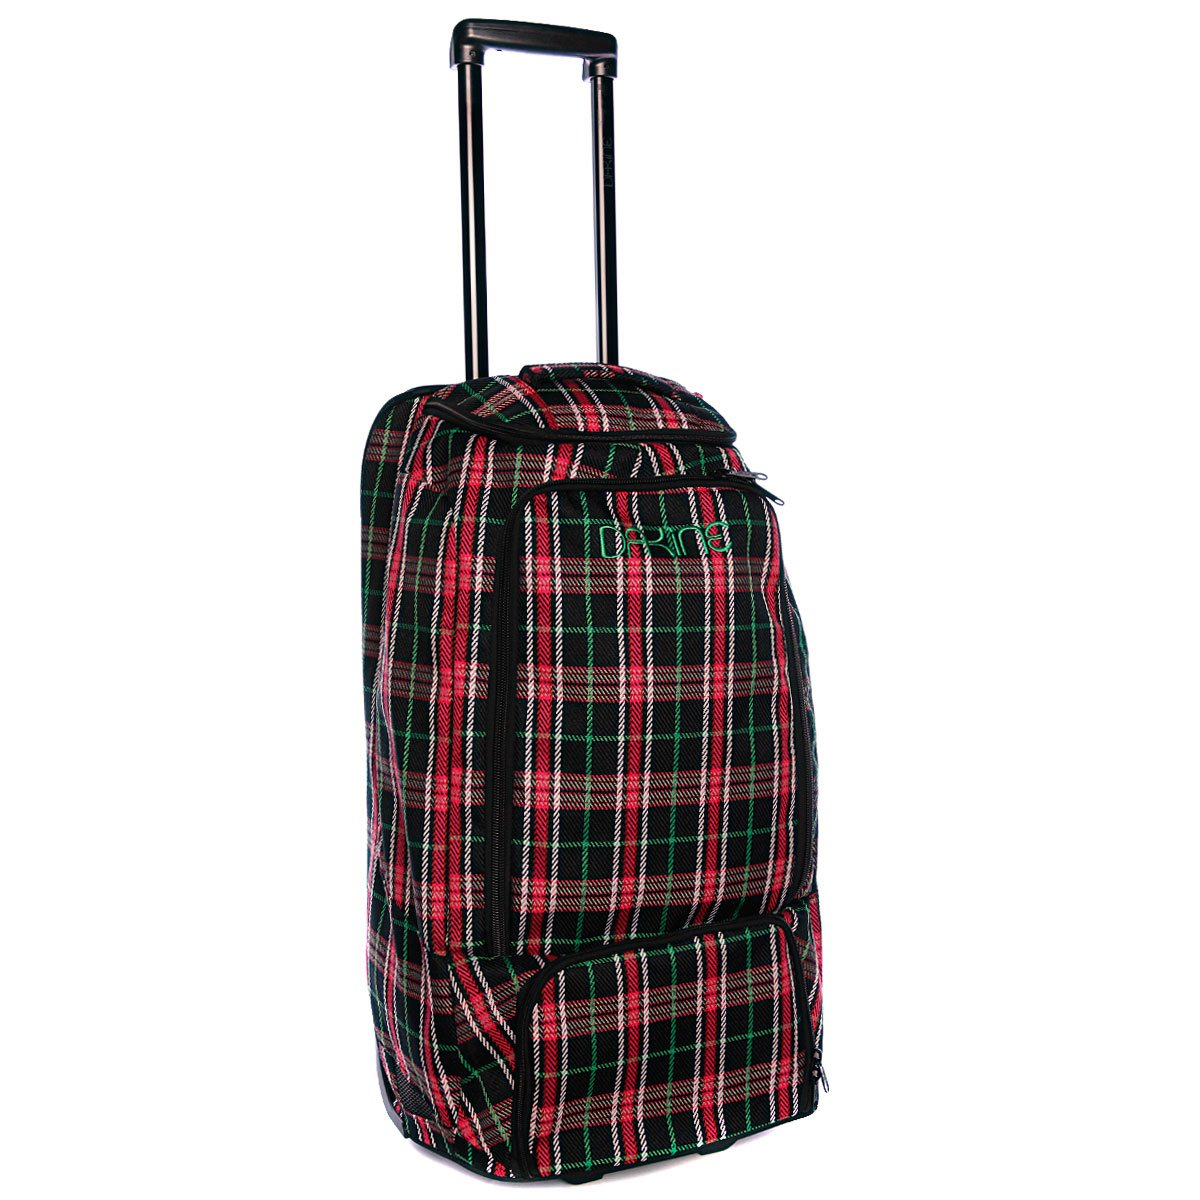 54ffd752e06c Купить сумку дорожная женскую Dakine Girls Ez Traveler 90 Pkpld ...